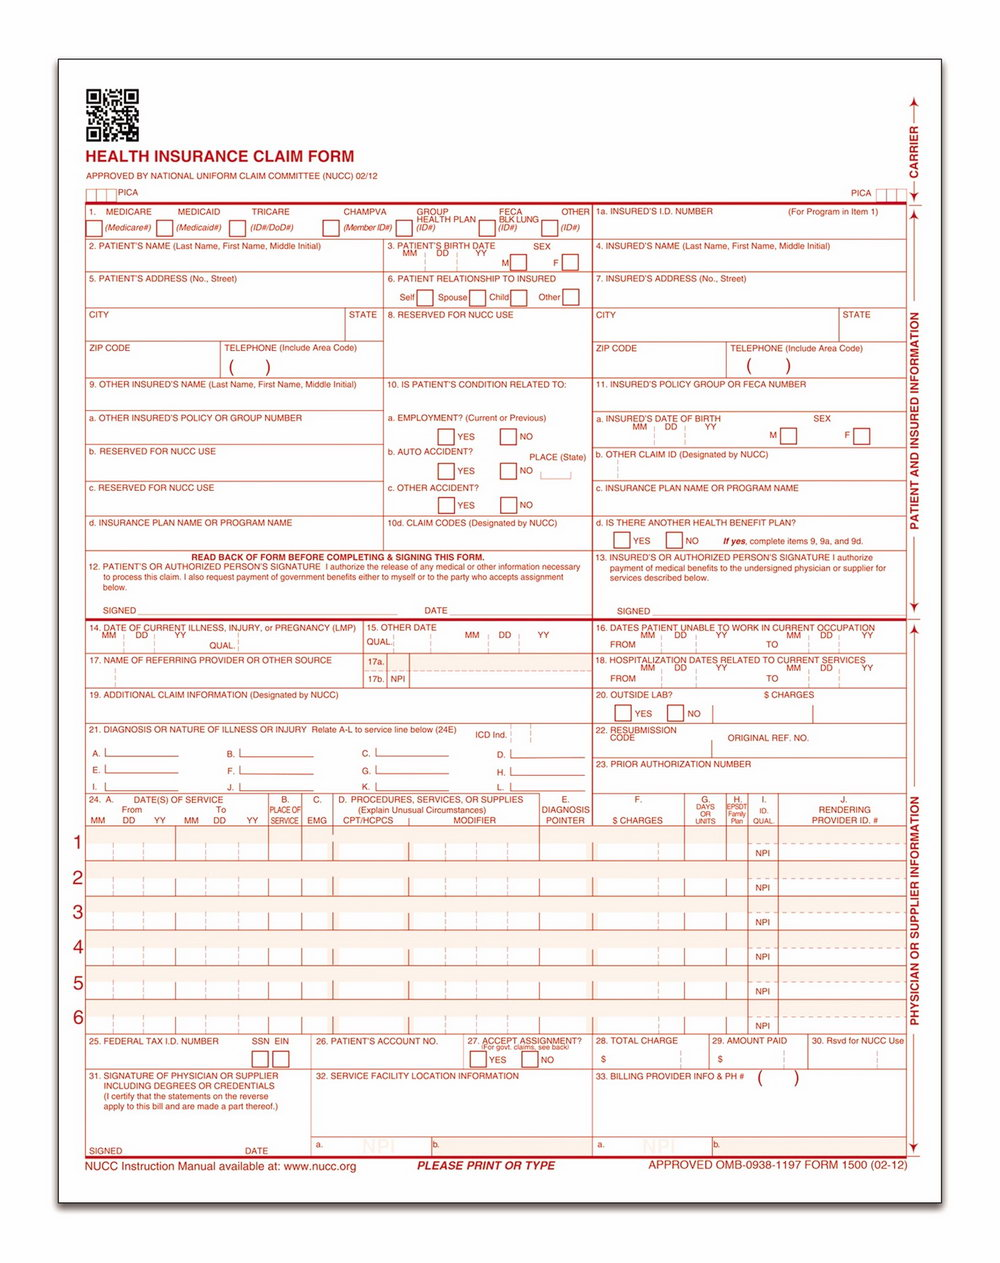 Printable Cms 1500 Form